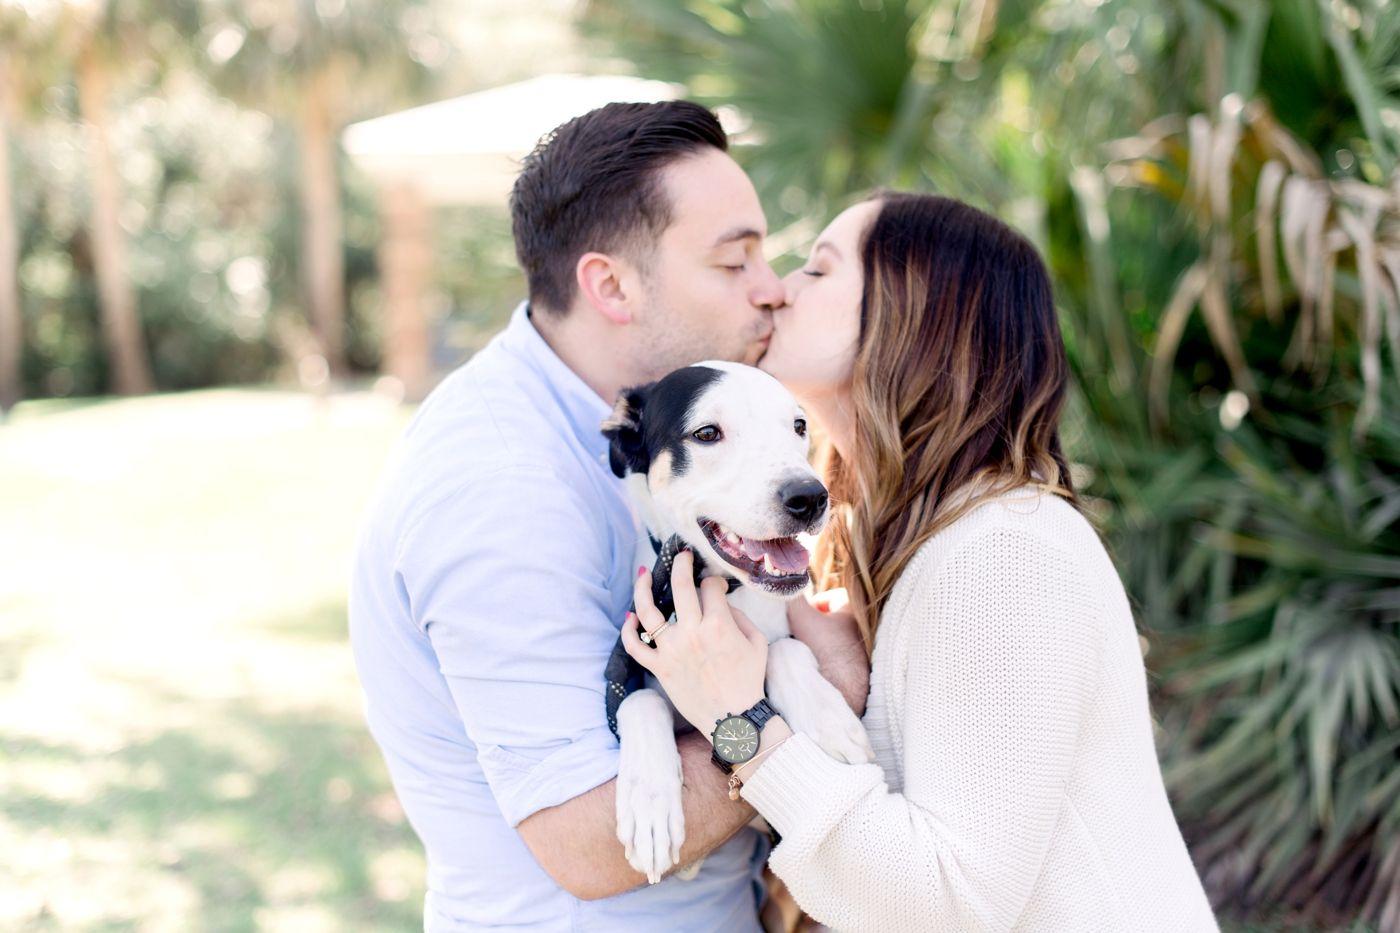 Pet Photography Fundraiser for Orlando Animal Rescue, The Pixel Fund #animalrescue